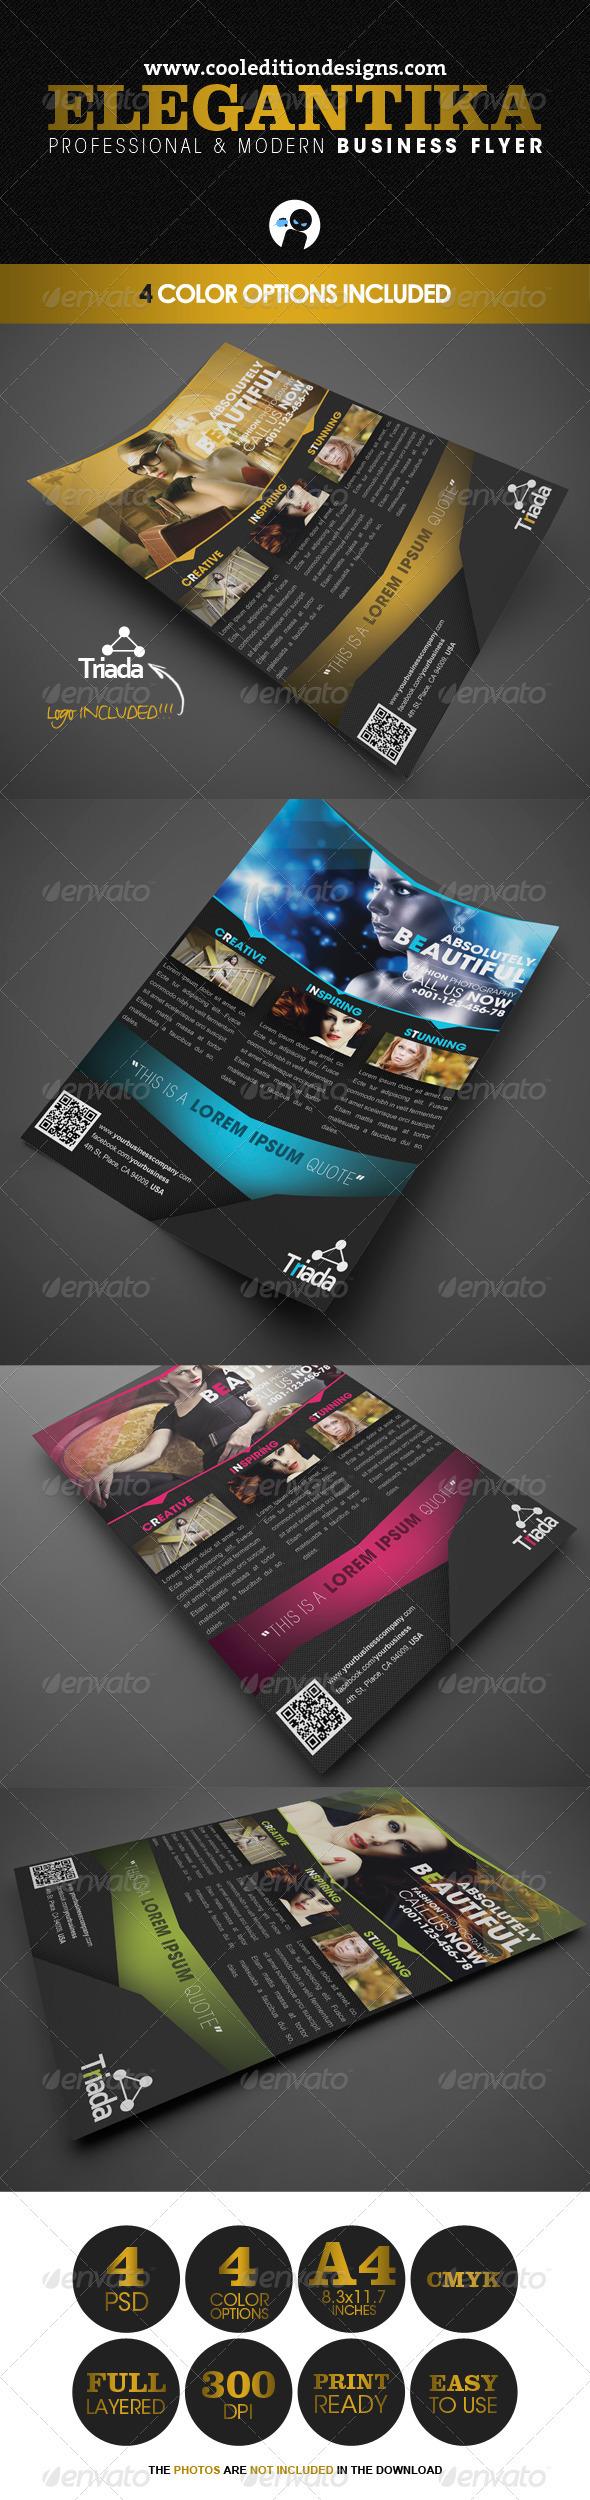 GraphicRiver Elegantika Professional & Modern Business Flyer 2353486